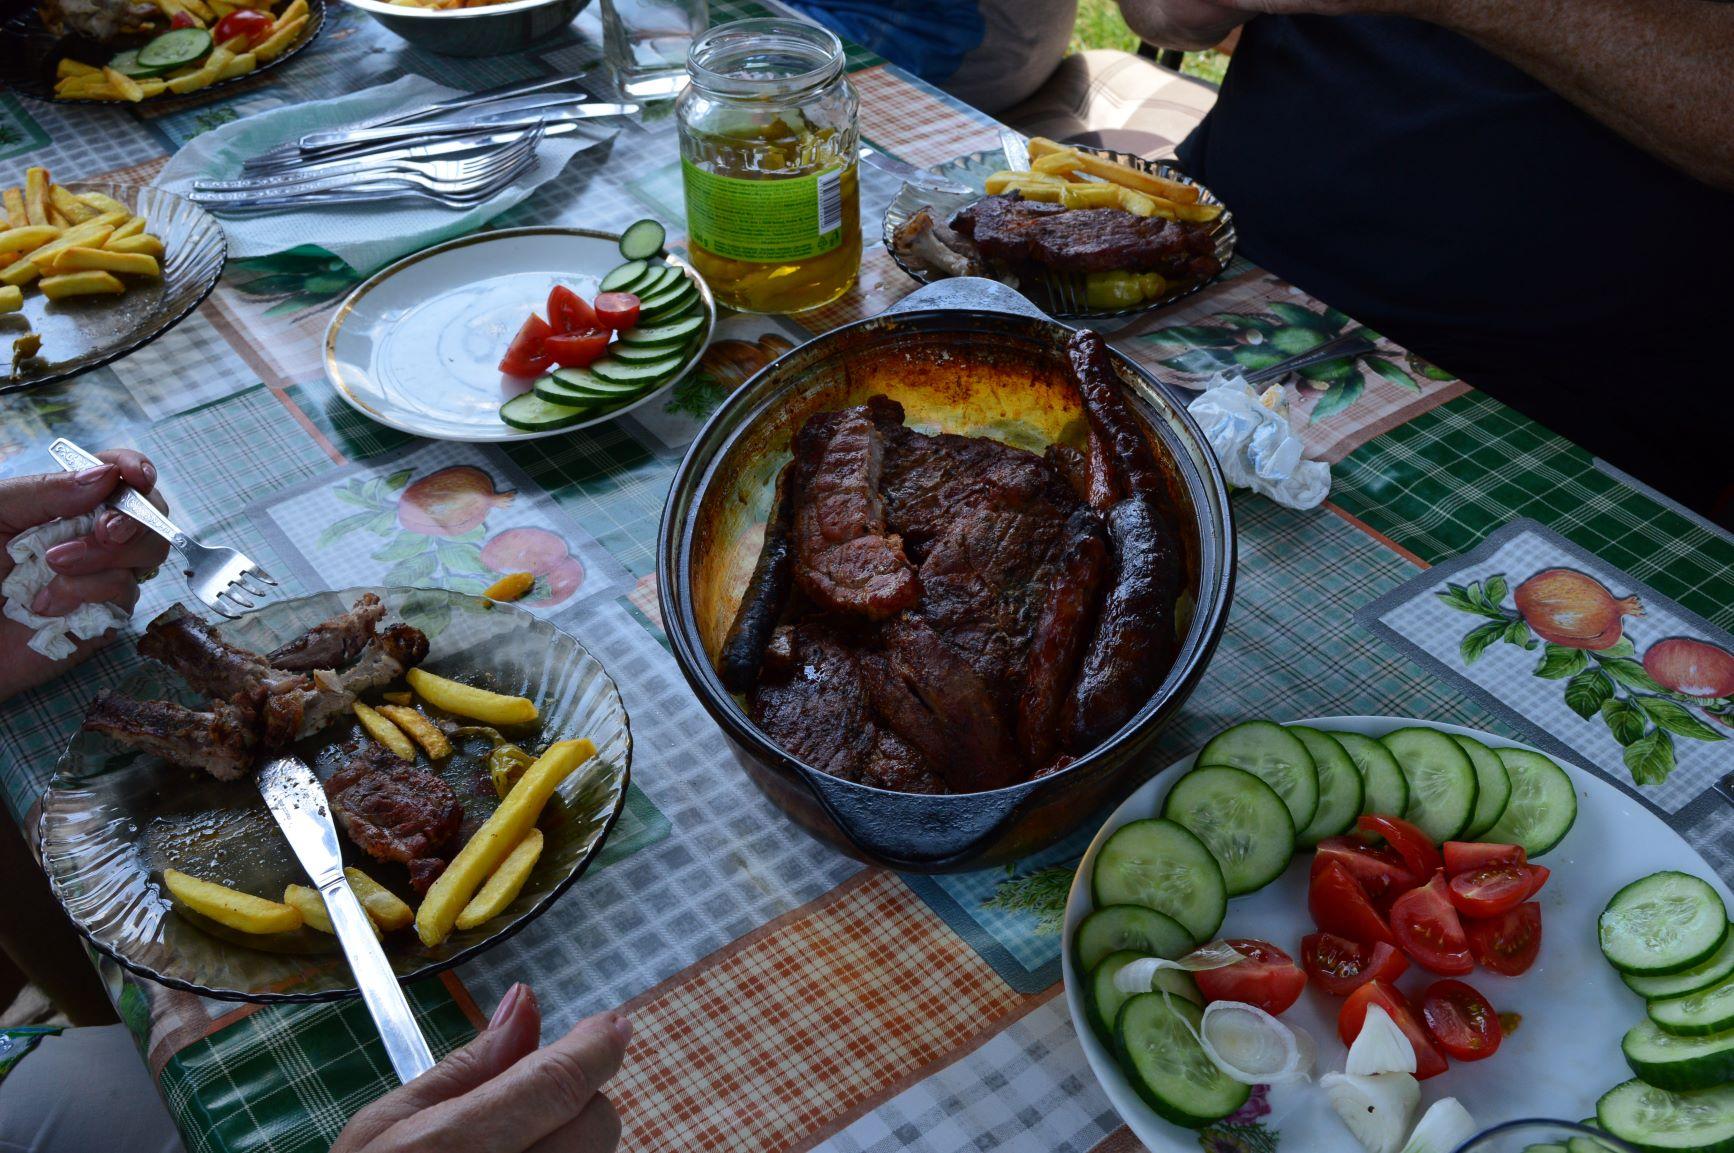 enjoying the meal 2